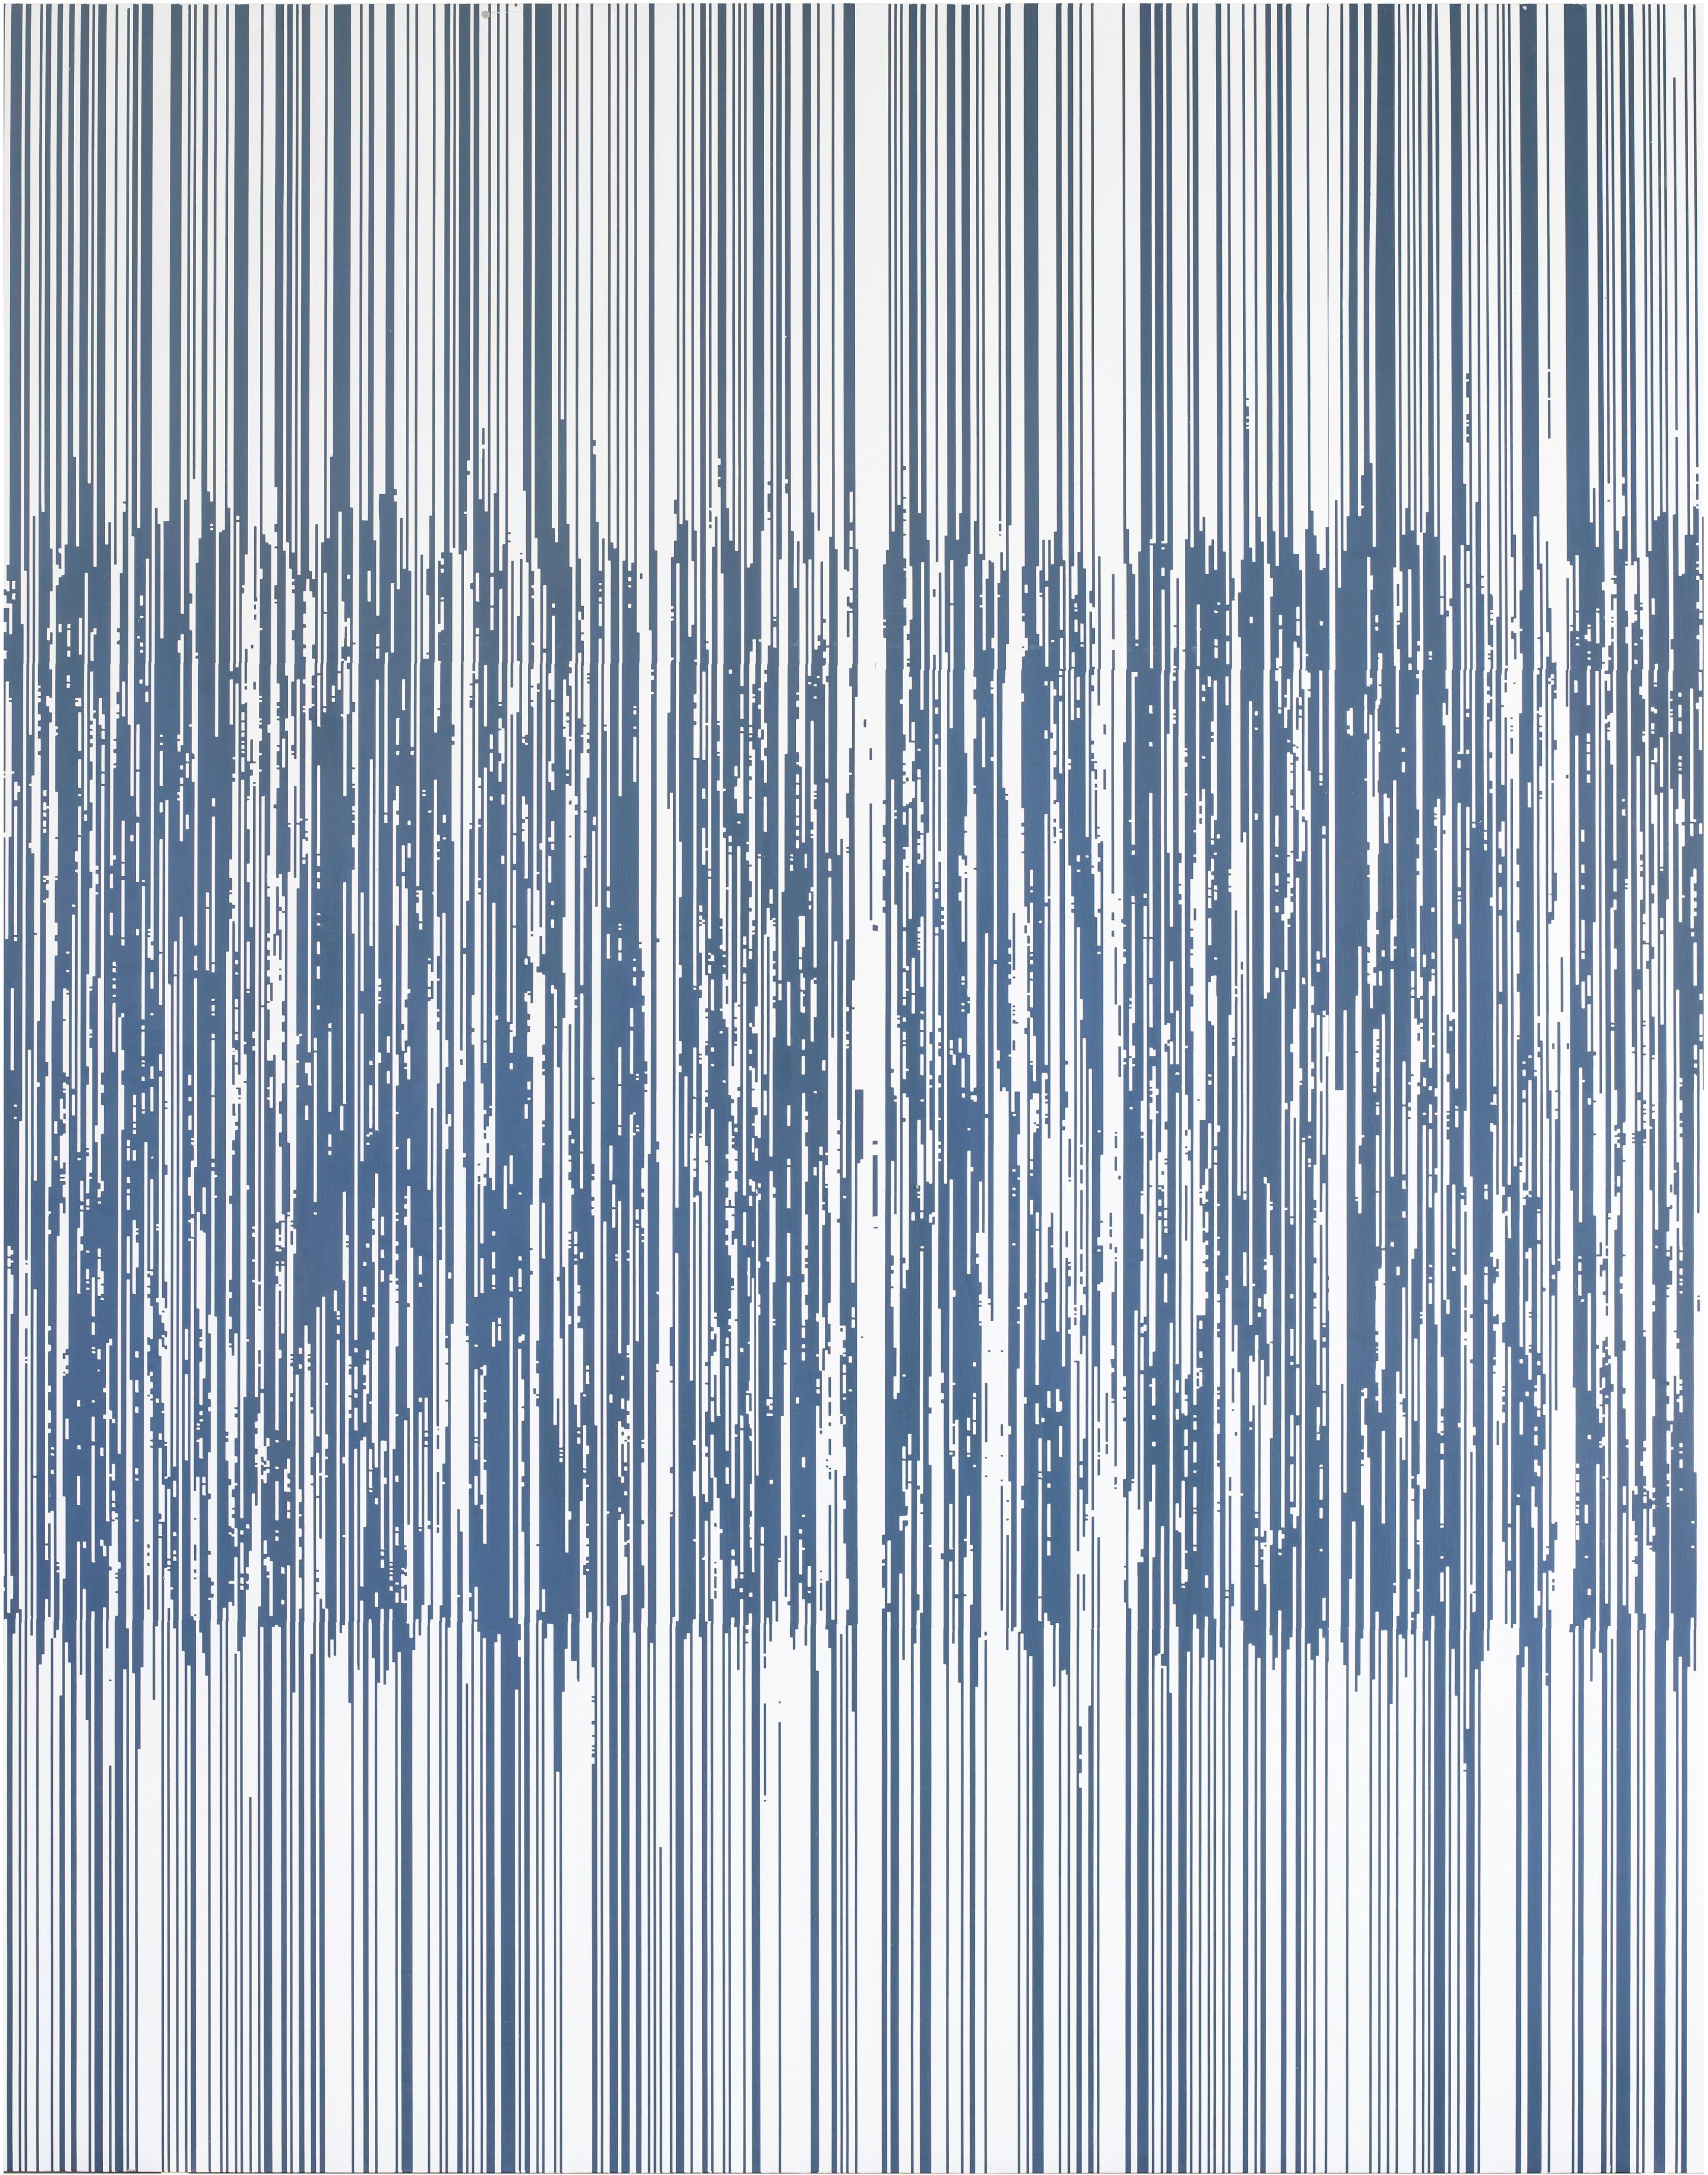 ENCODING 2015, acrylic on canvas, 227.3x181.8cm (10)